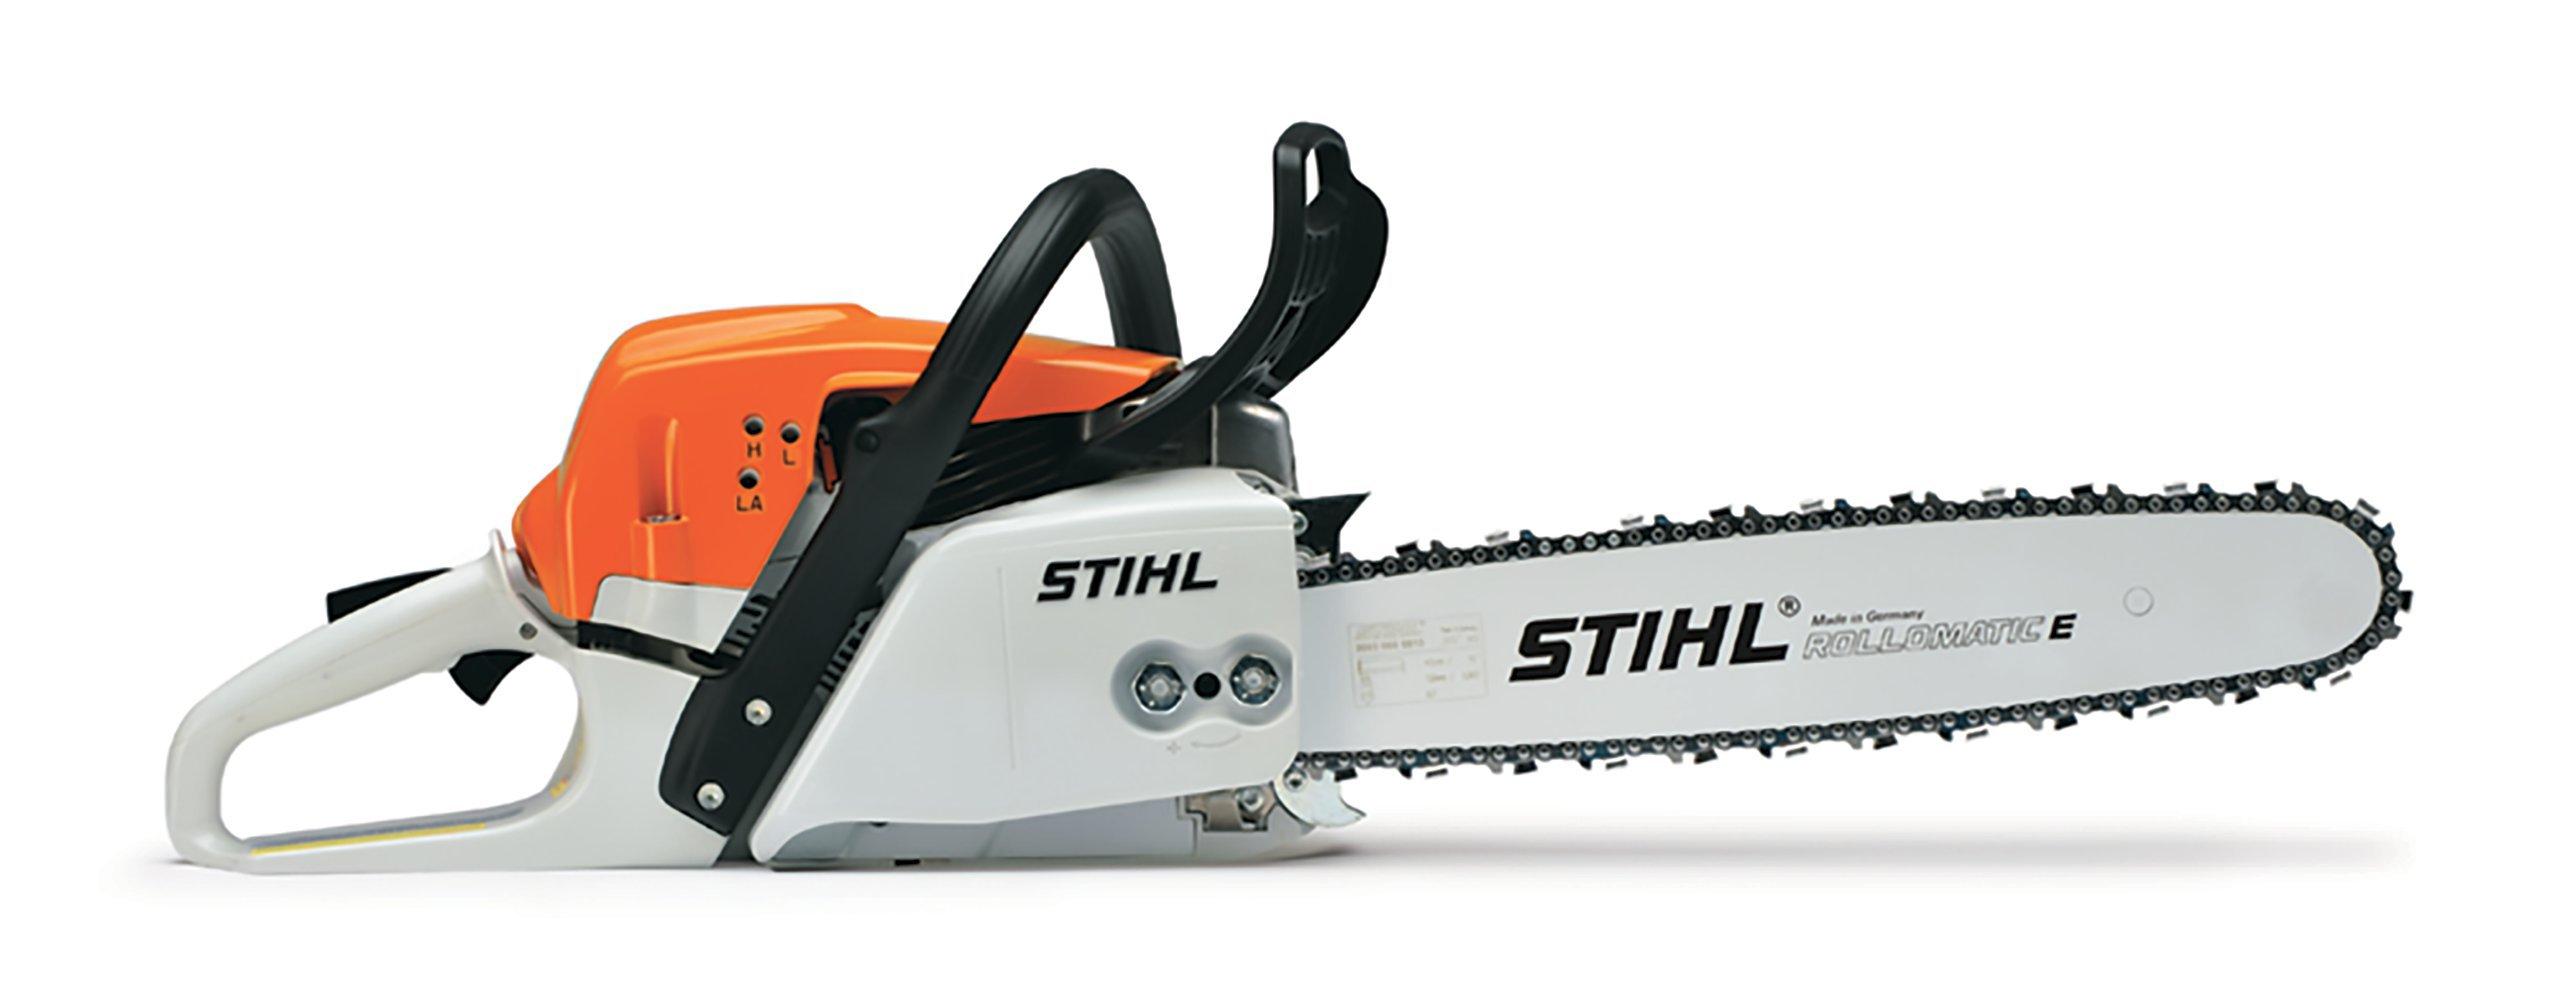 Murdoch's – STIHL - MS 271 Chainsaw 20